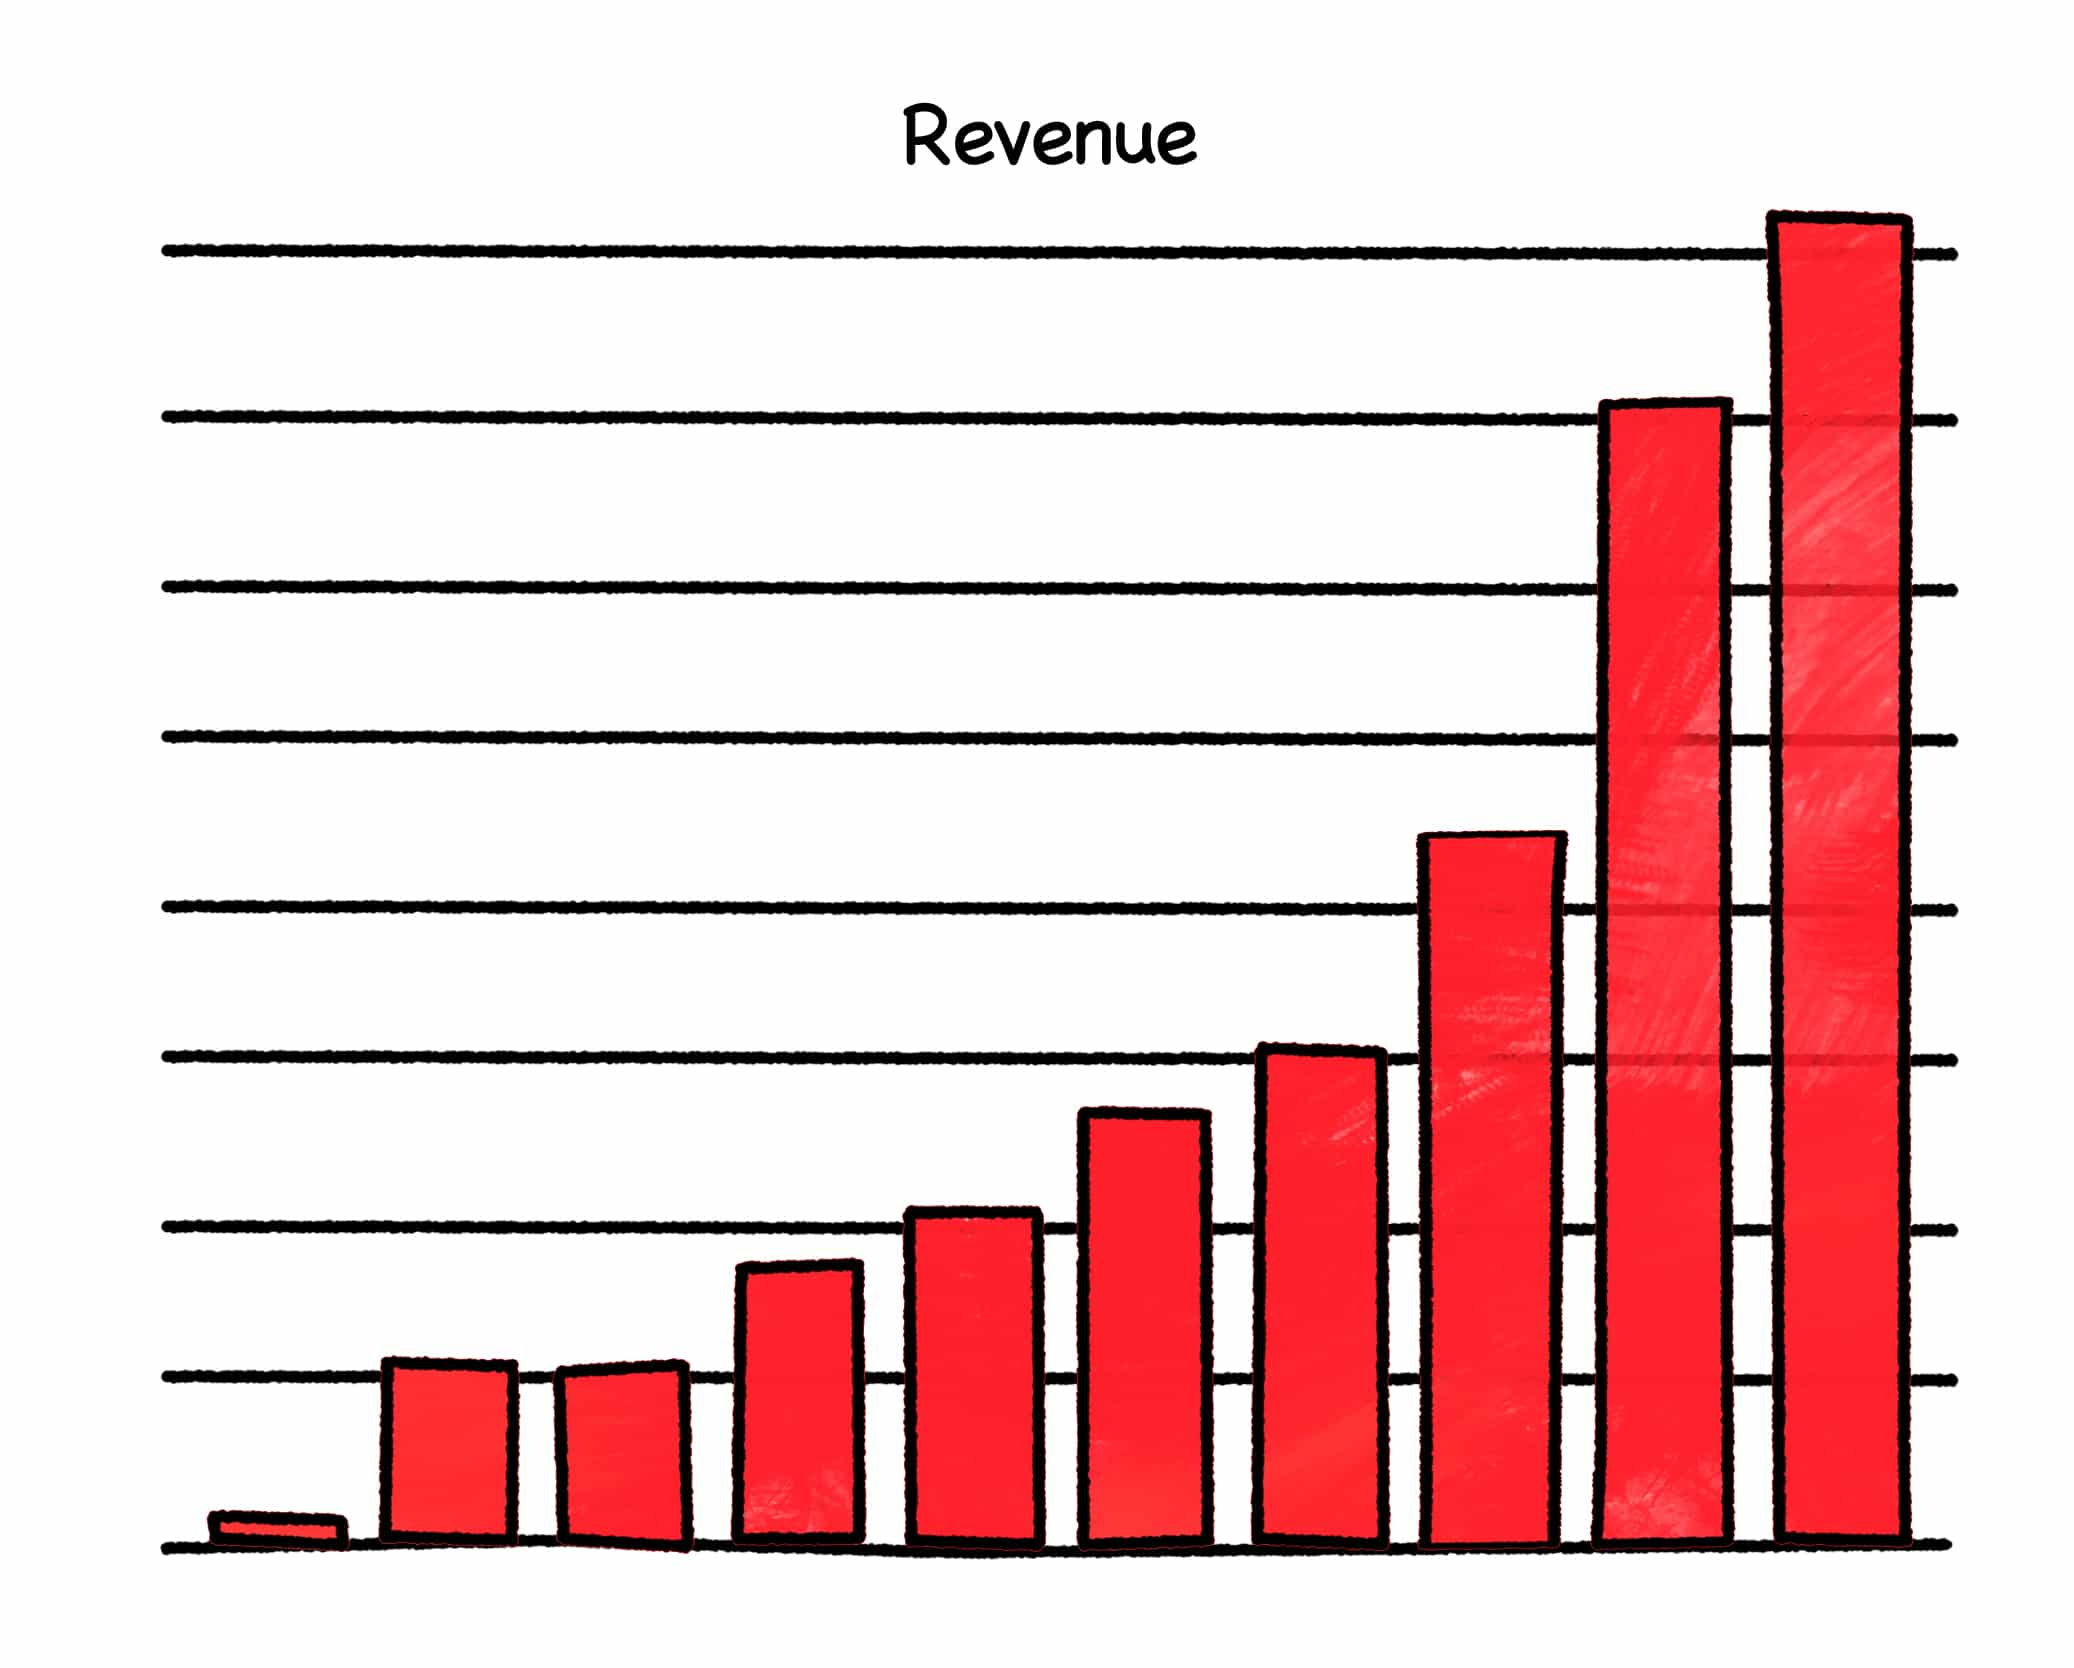 Tamagotchi angel growth chart image collections free any chart maltipoo growth chart image collections free any chart examples medcalc growth charts image collections free any nvjuhfo Images